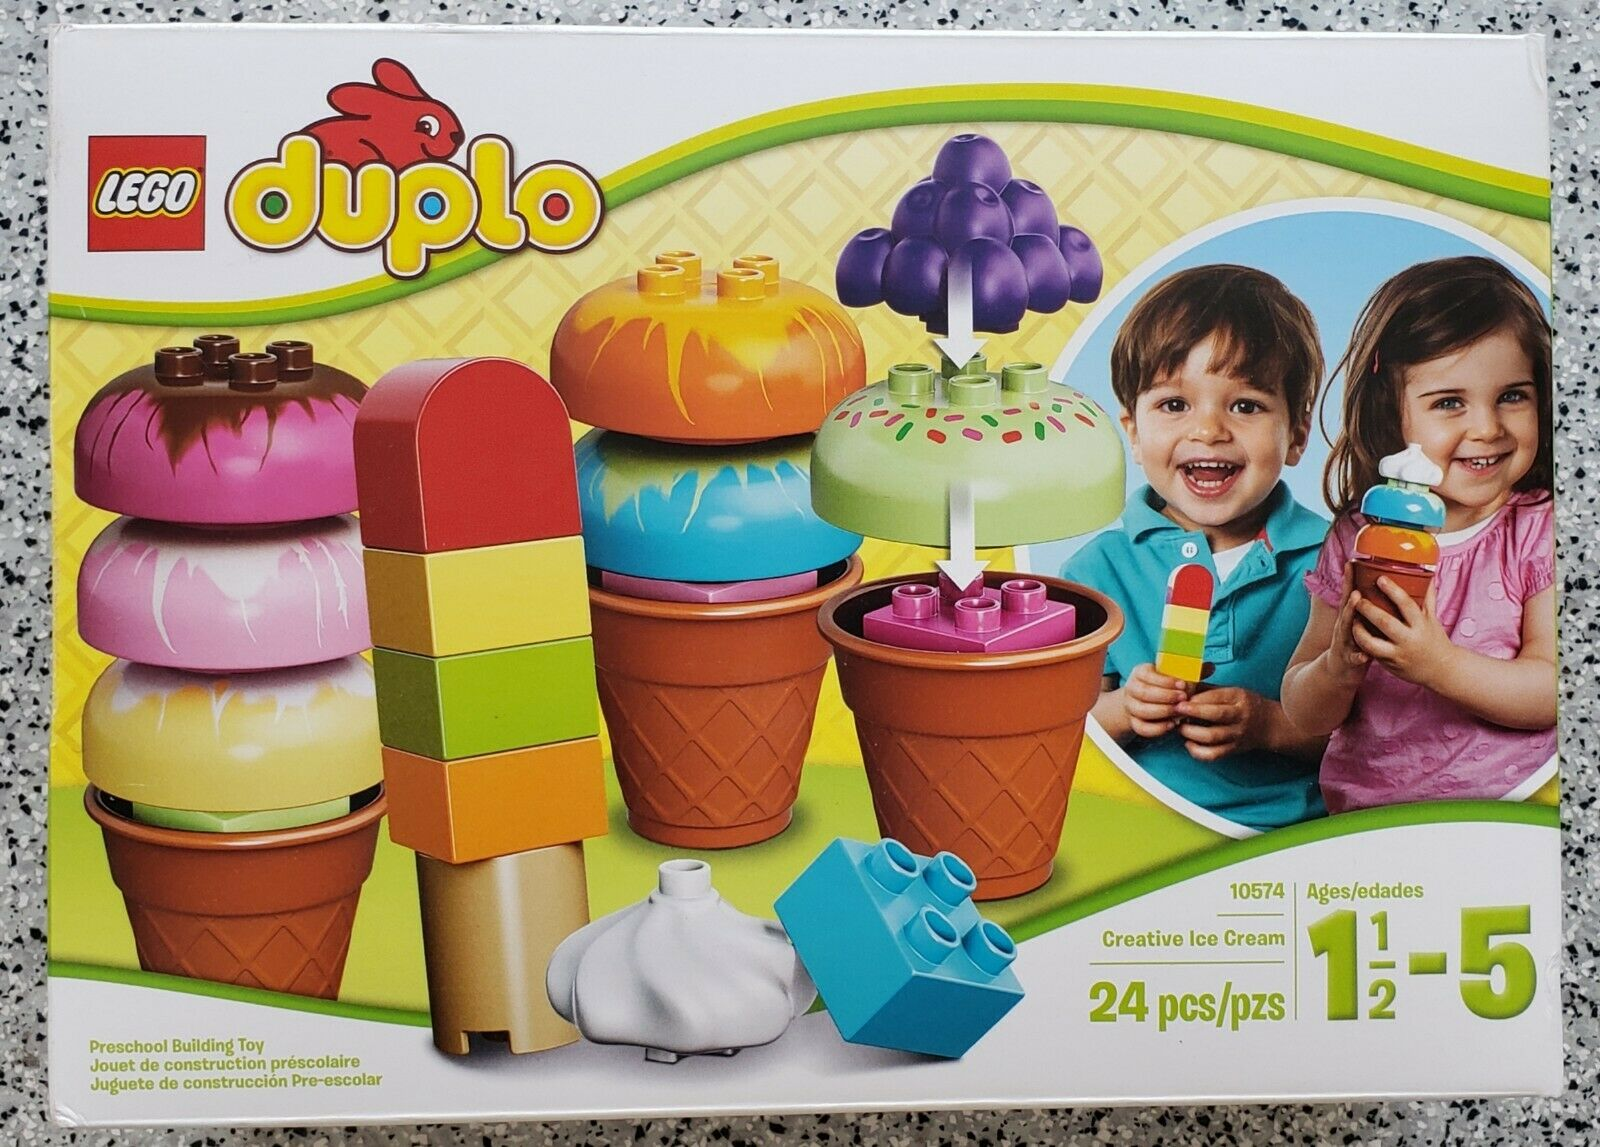 Lego Duplo Creative Ice  Cream (10574)  Nouvelle liste